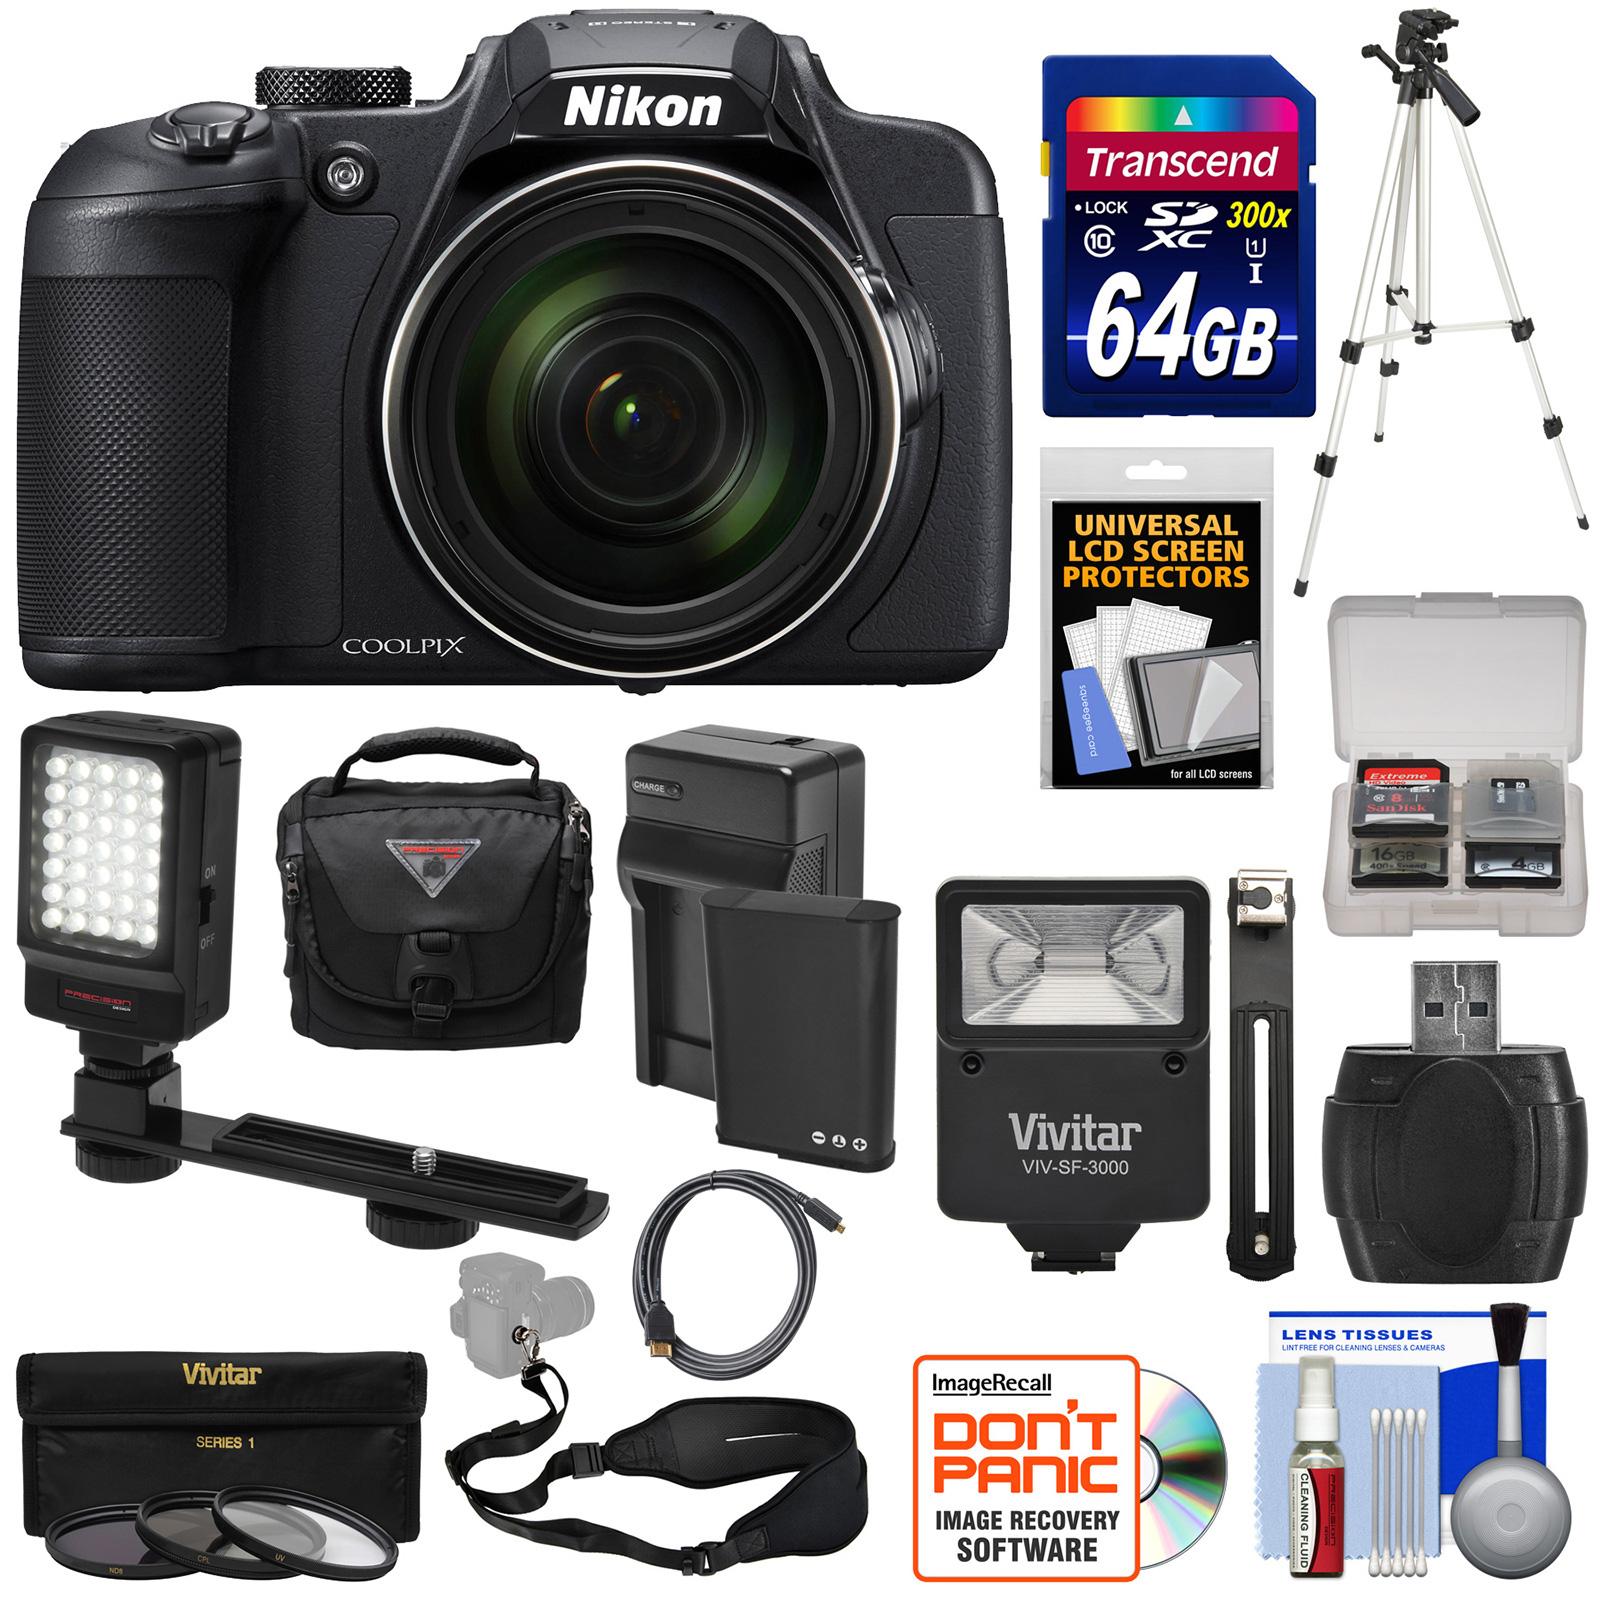 Nikon Coolpix B700 4K Wi-Fi Digital Camera with 64GB Card + Battery & Charger + Case + Flash + LED + Strap + Tripod + 3 Filters + Kit Coolpix